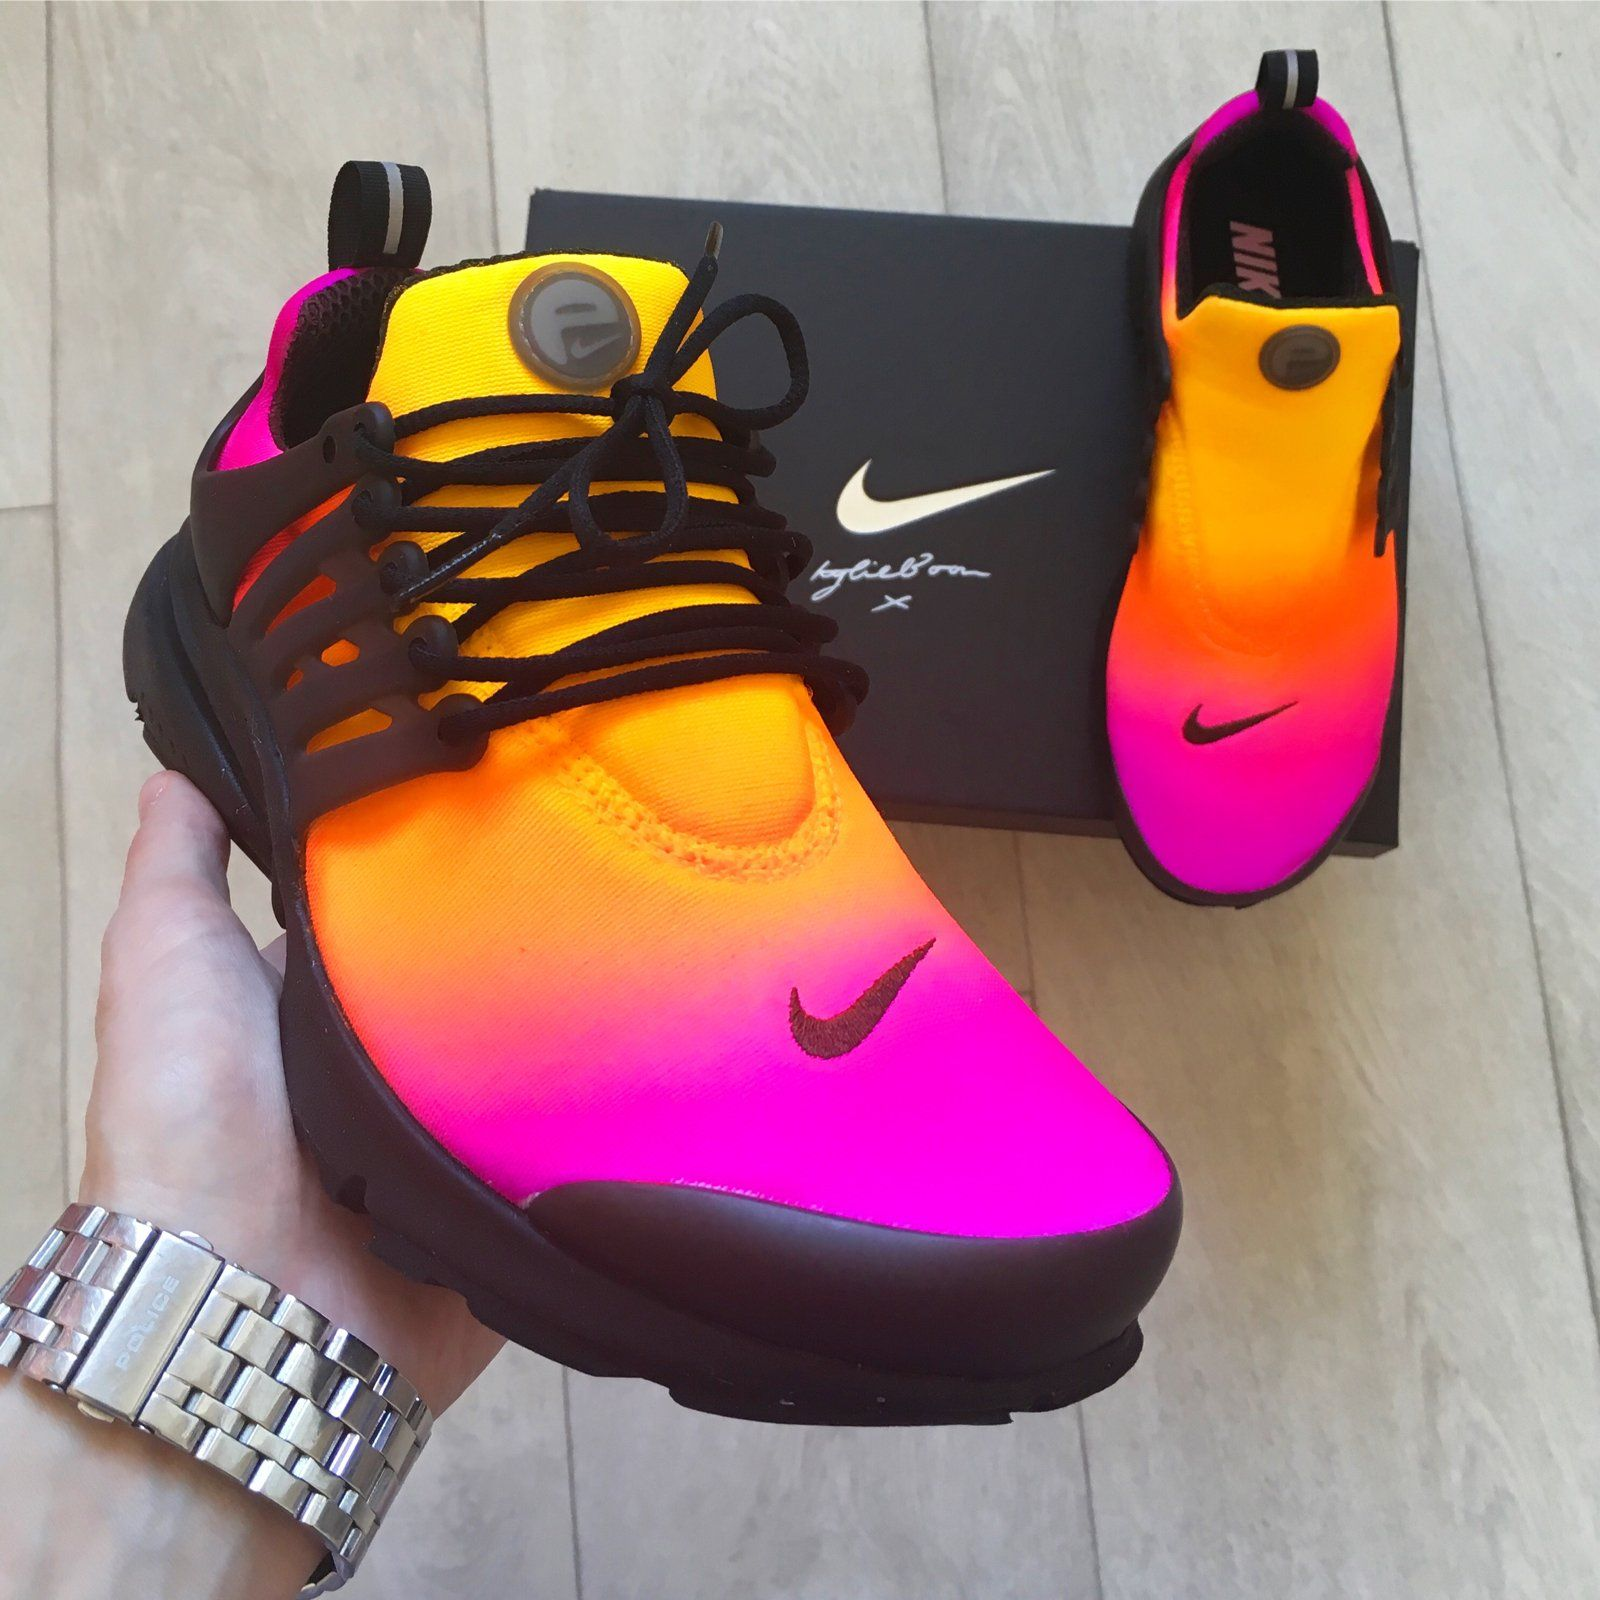 INSTAGRAM Nike Presto (SEND YOUR OWN PRESTO!)